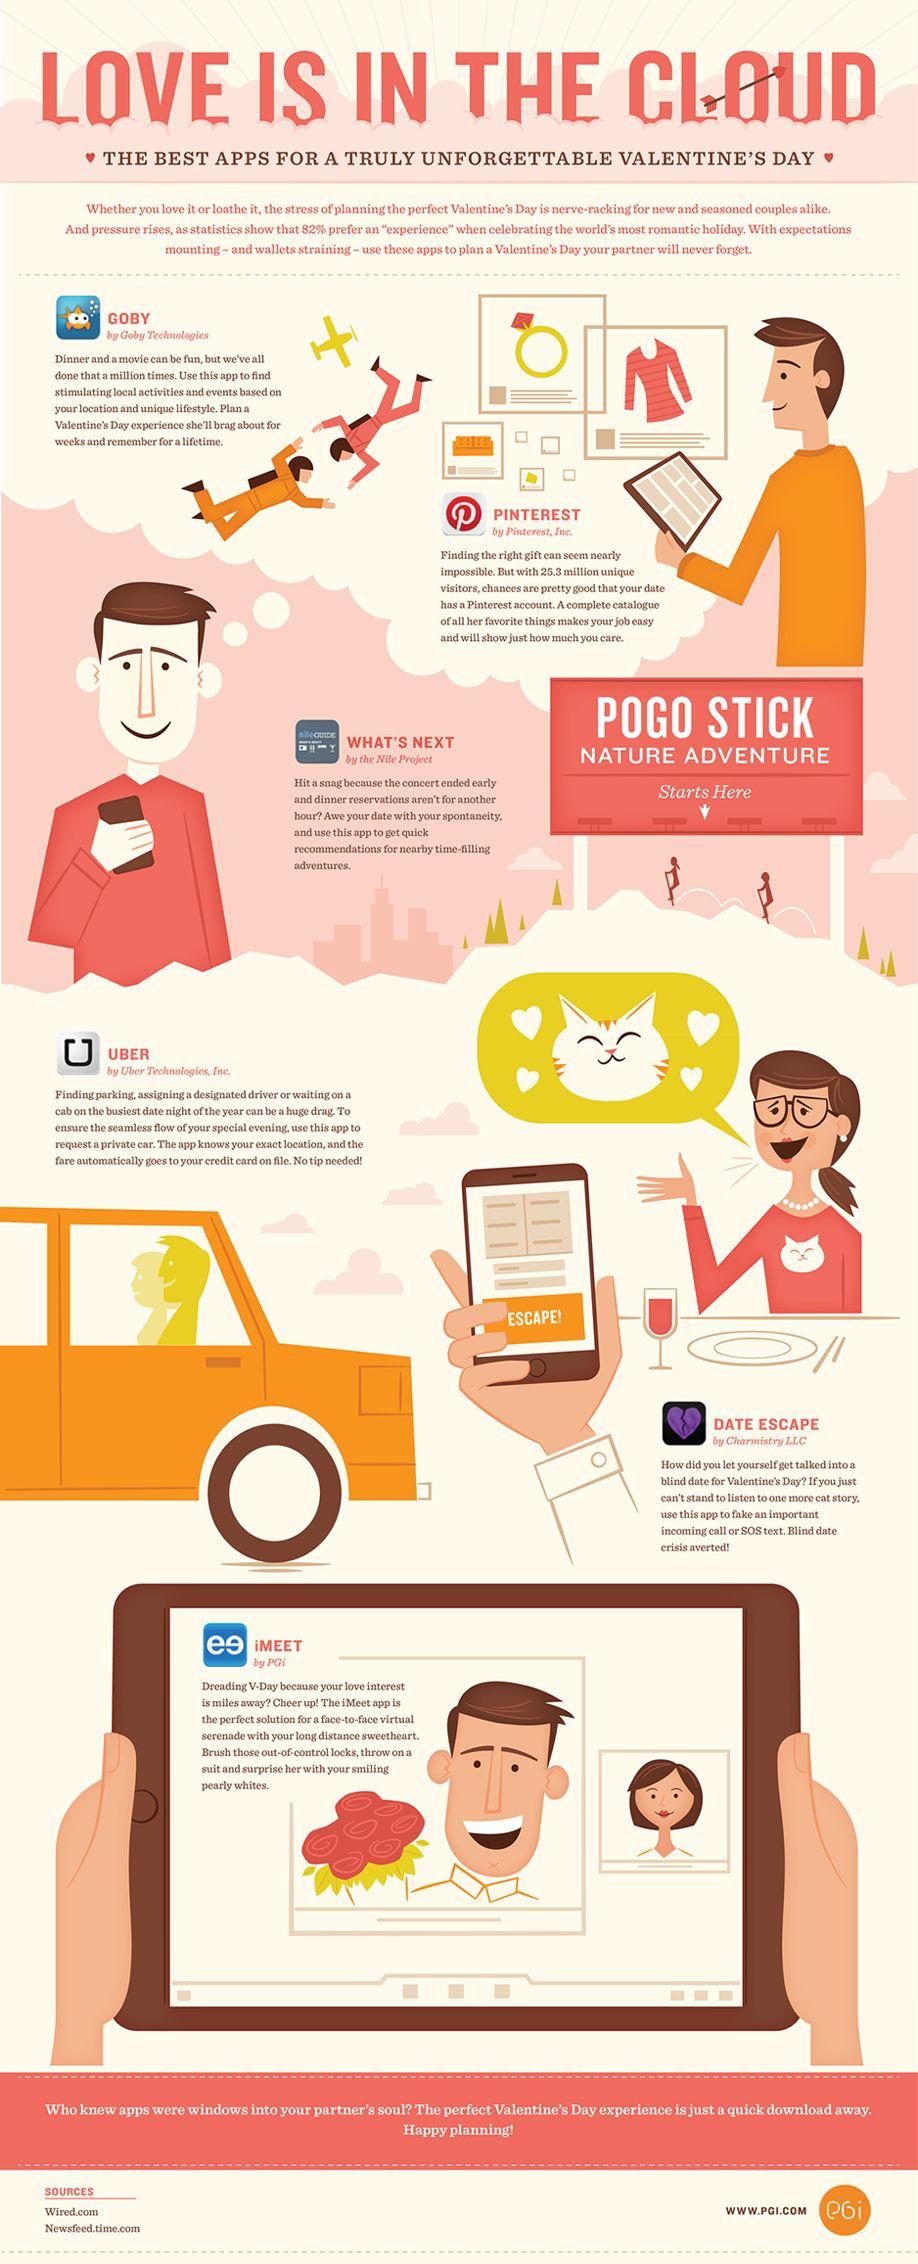 Pgi Imeet Valentines C5 Infographic App Best Apps